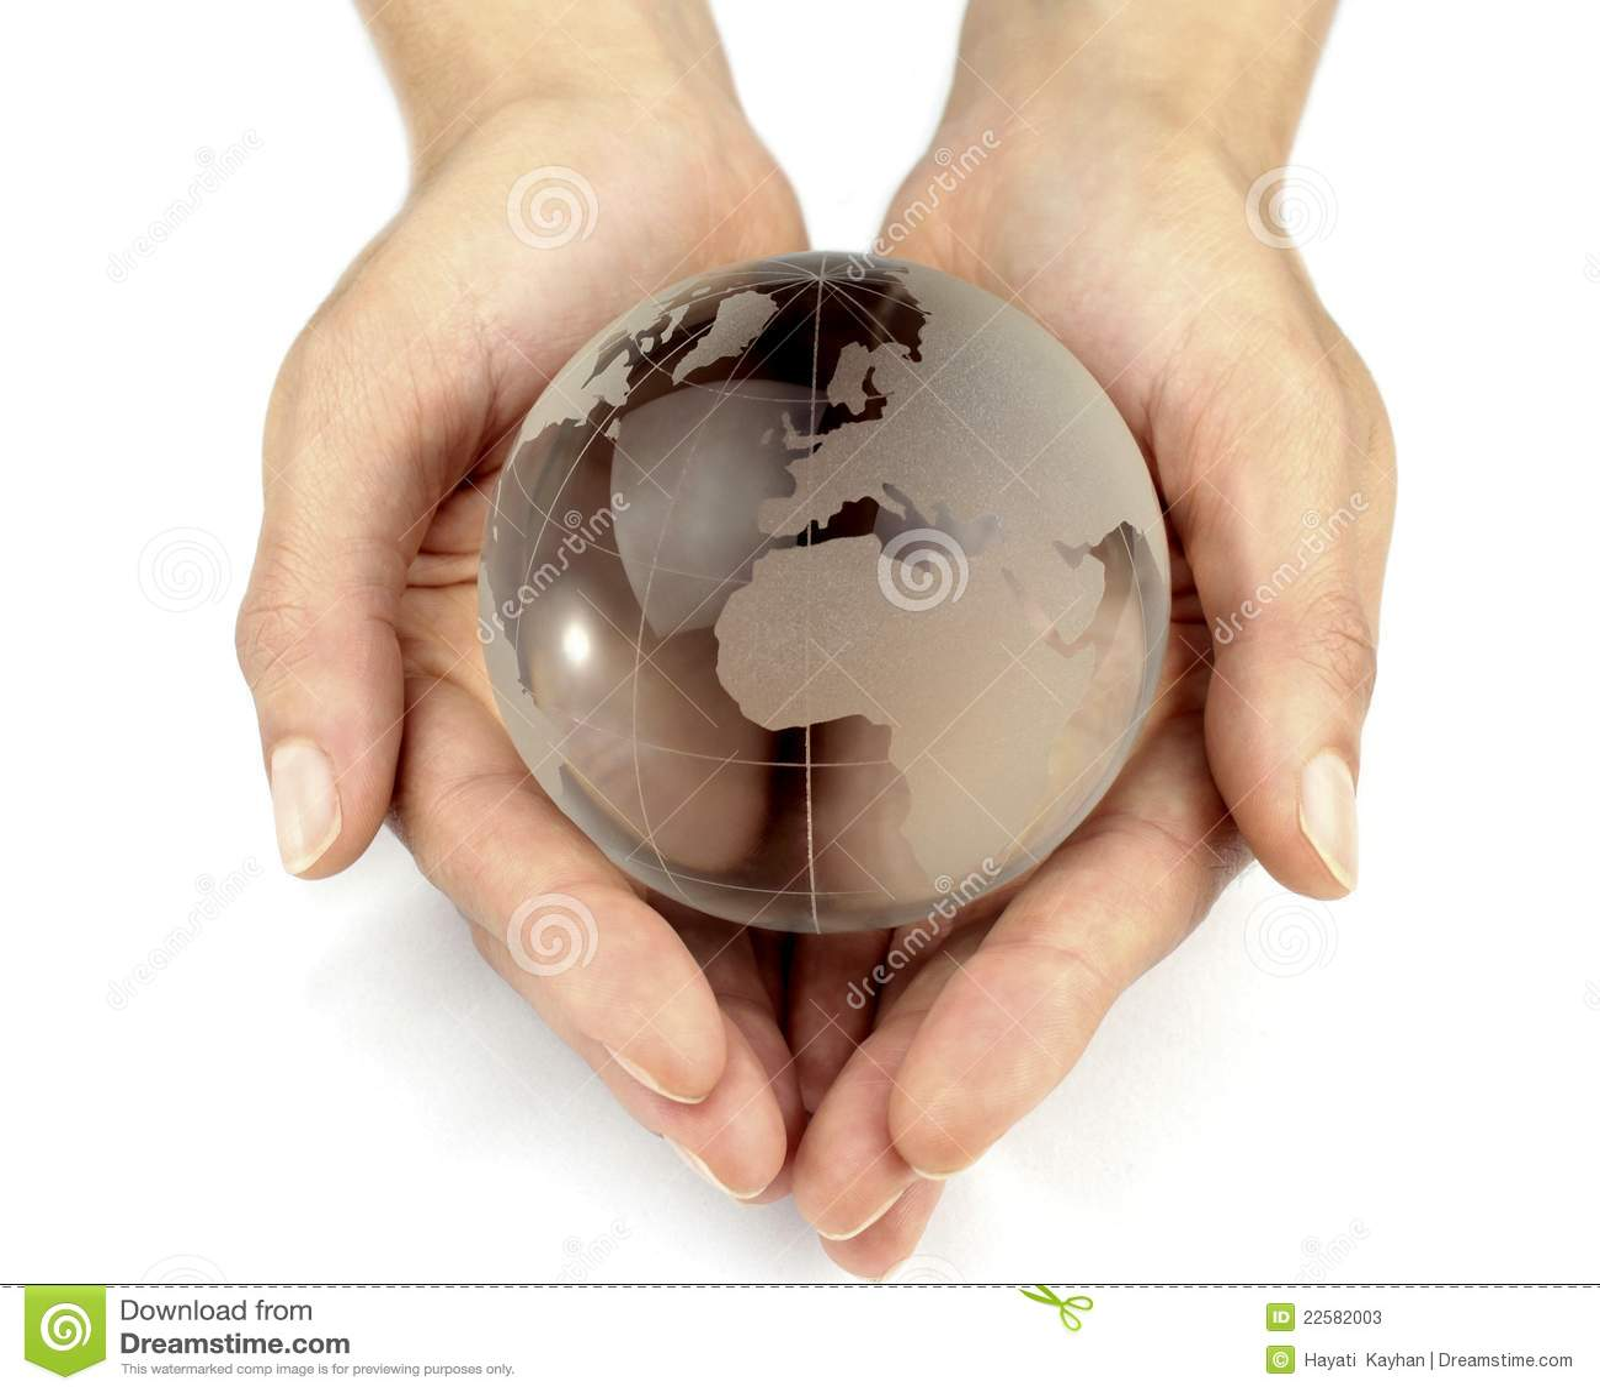 Globo de vidro nas mãos